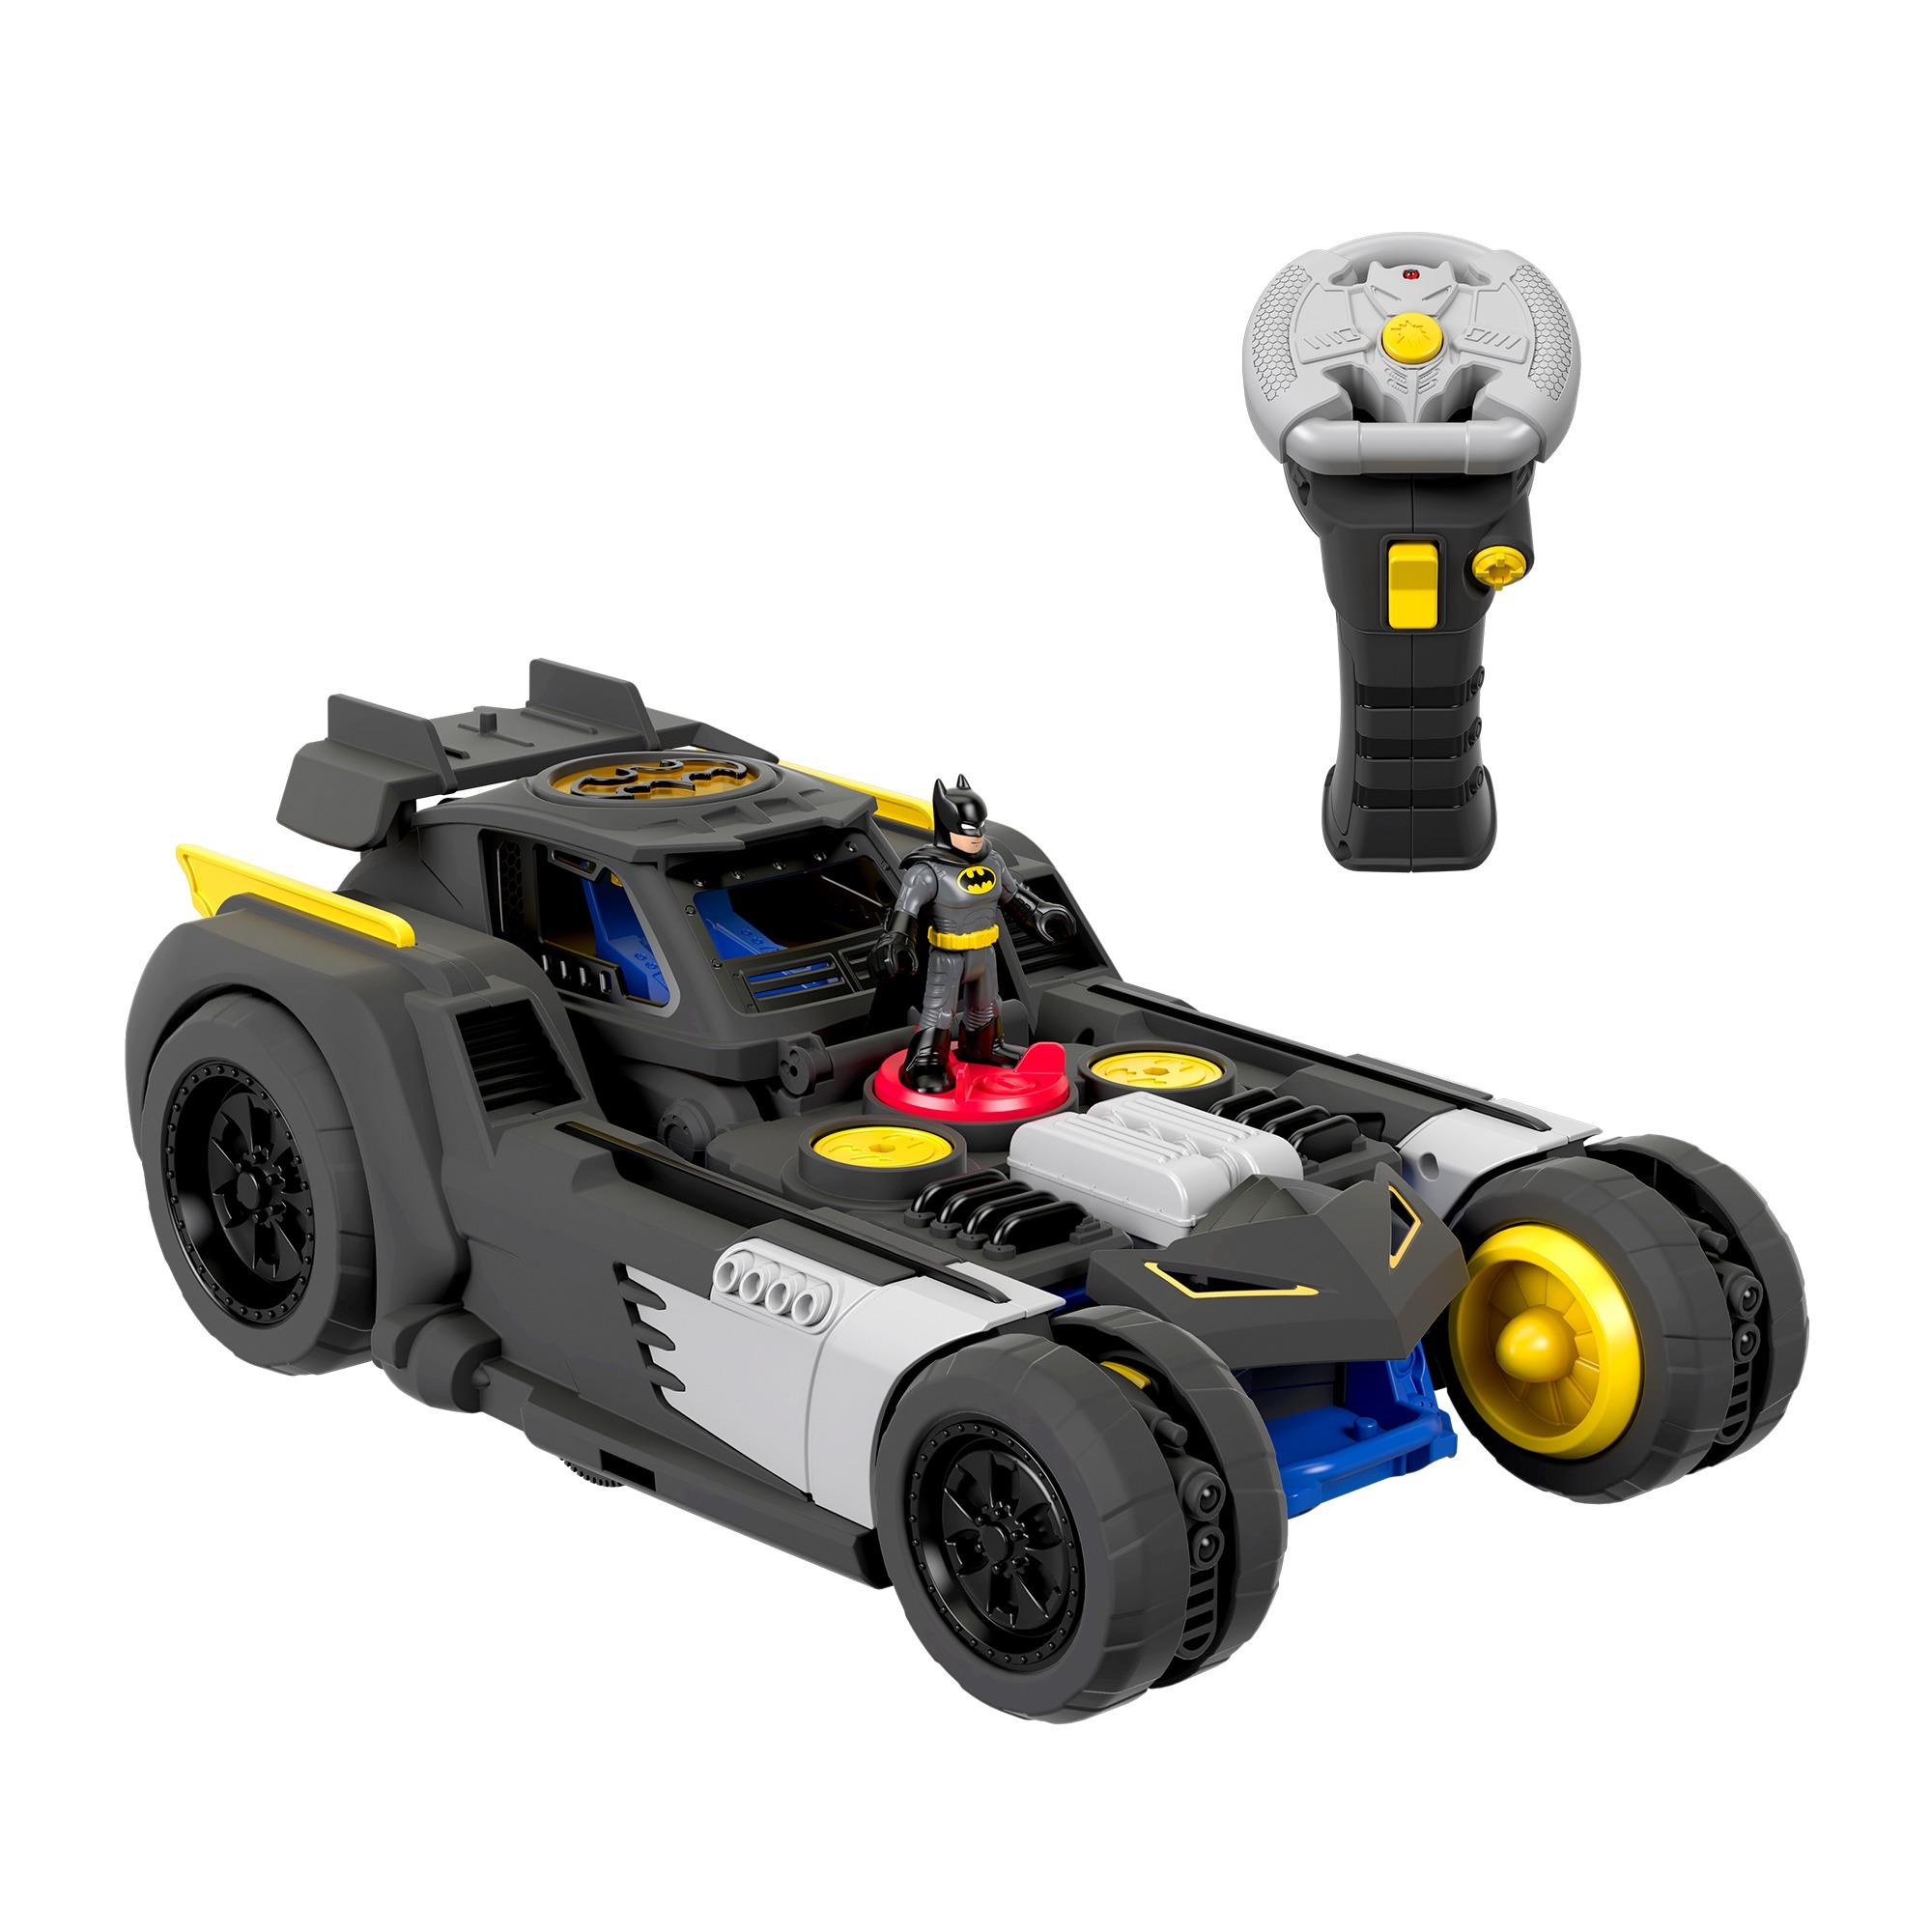 Imaginext DC Super Friends Transforming Batmobile R/C Vehicle $59.00 Walmart / Amazon